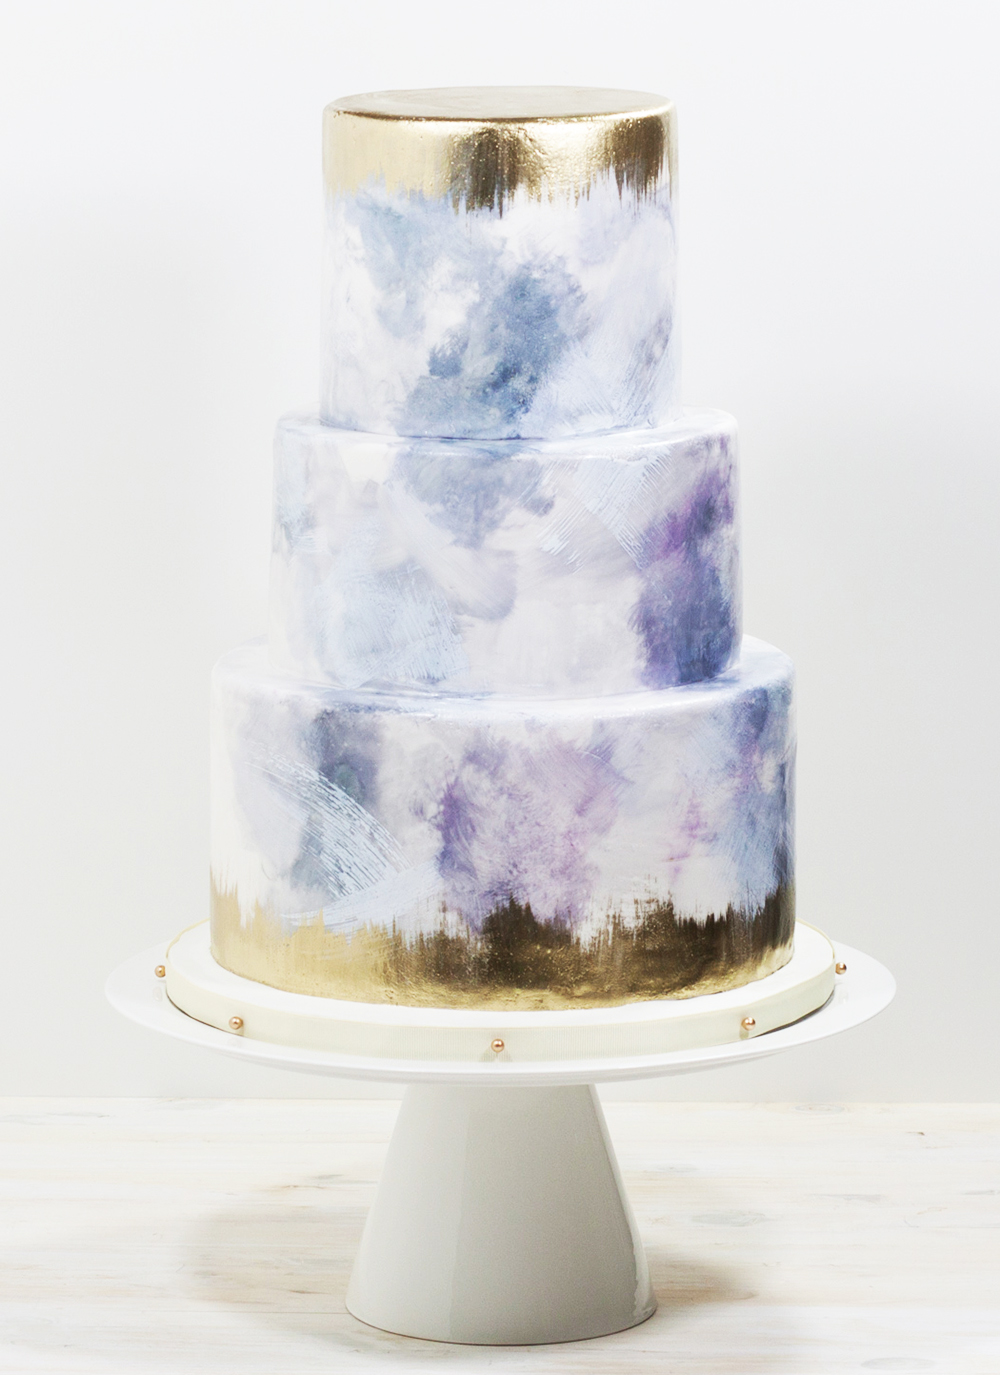 painted-grey-gold-wedding-cake-whipped-bakeshop